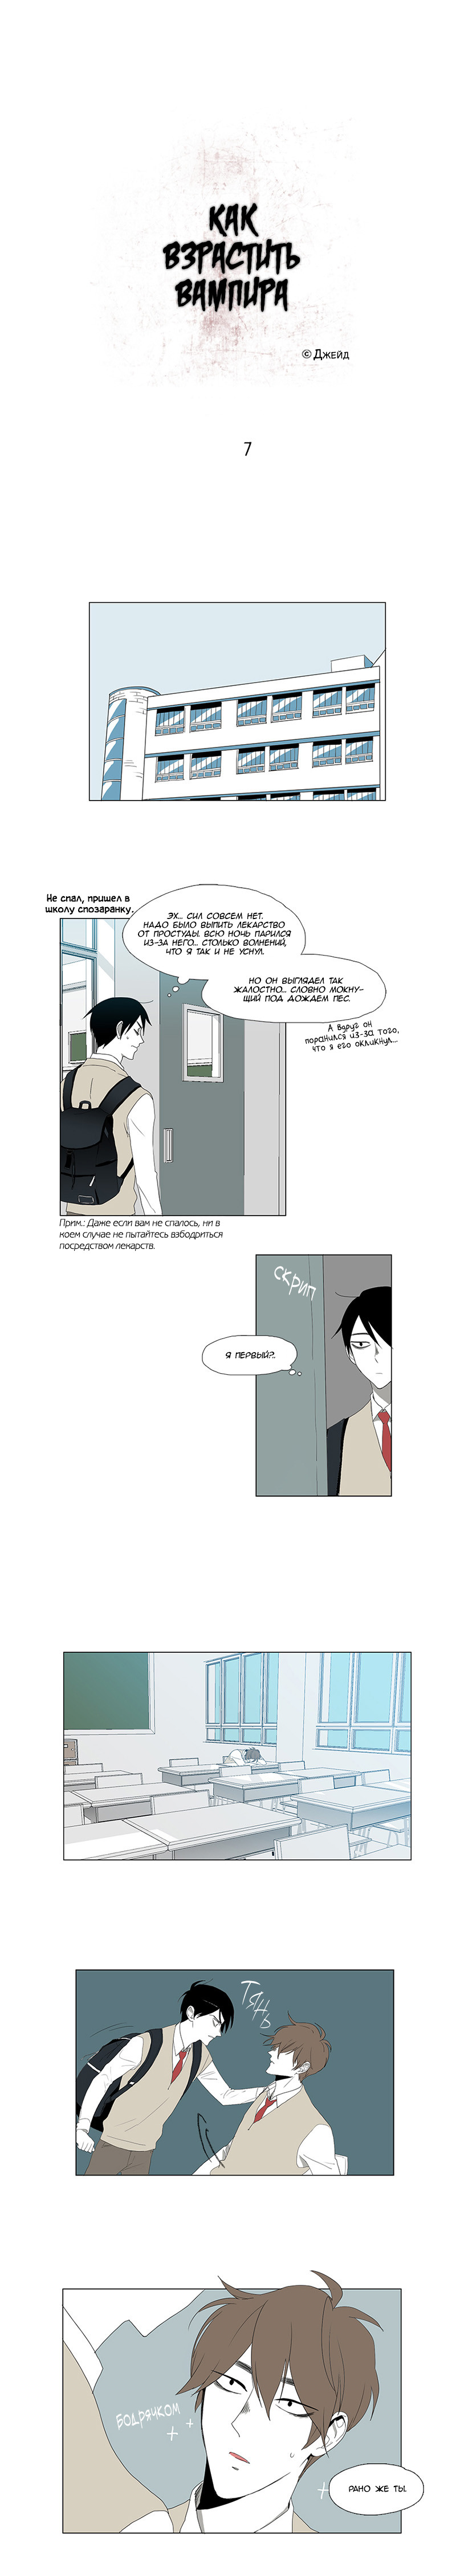 https://r1.ninemanga.com/comics/pic2/33/27873/278406/1447697131885.jpg Page 5